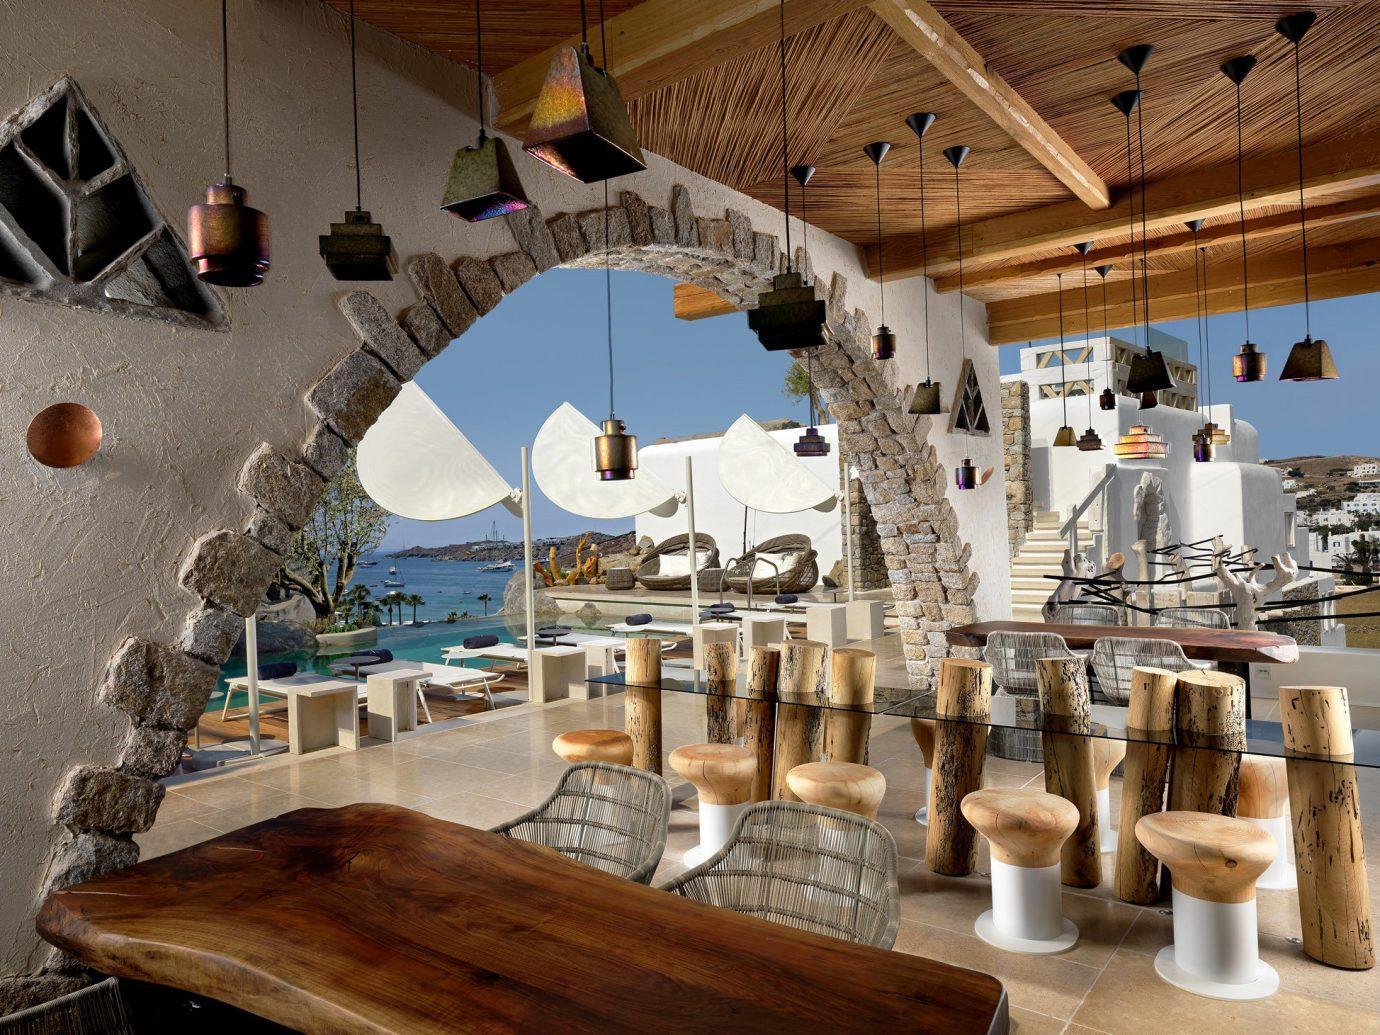 Hotels indoor wood restaurant Resort interior design tourist attraction